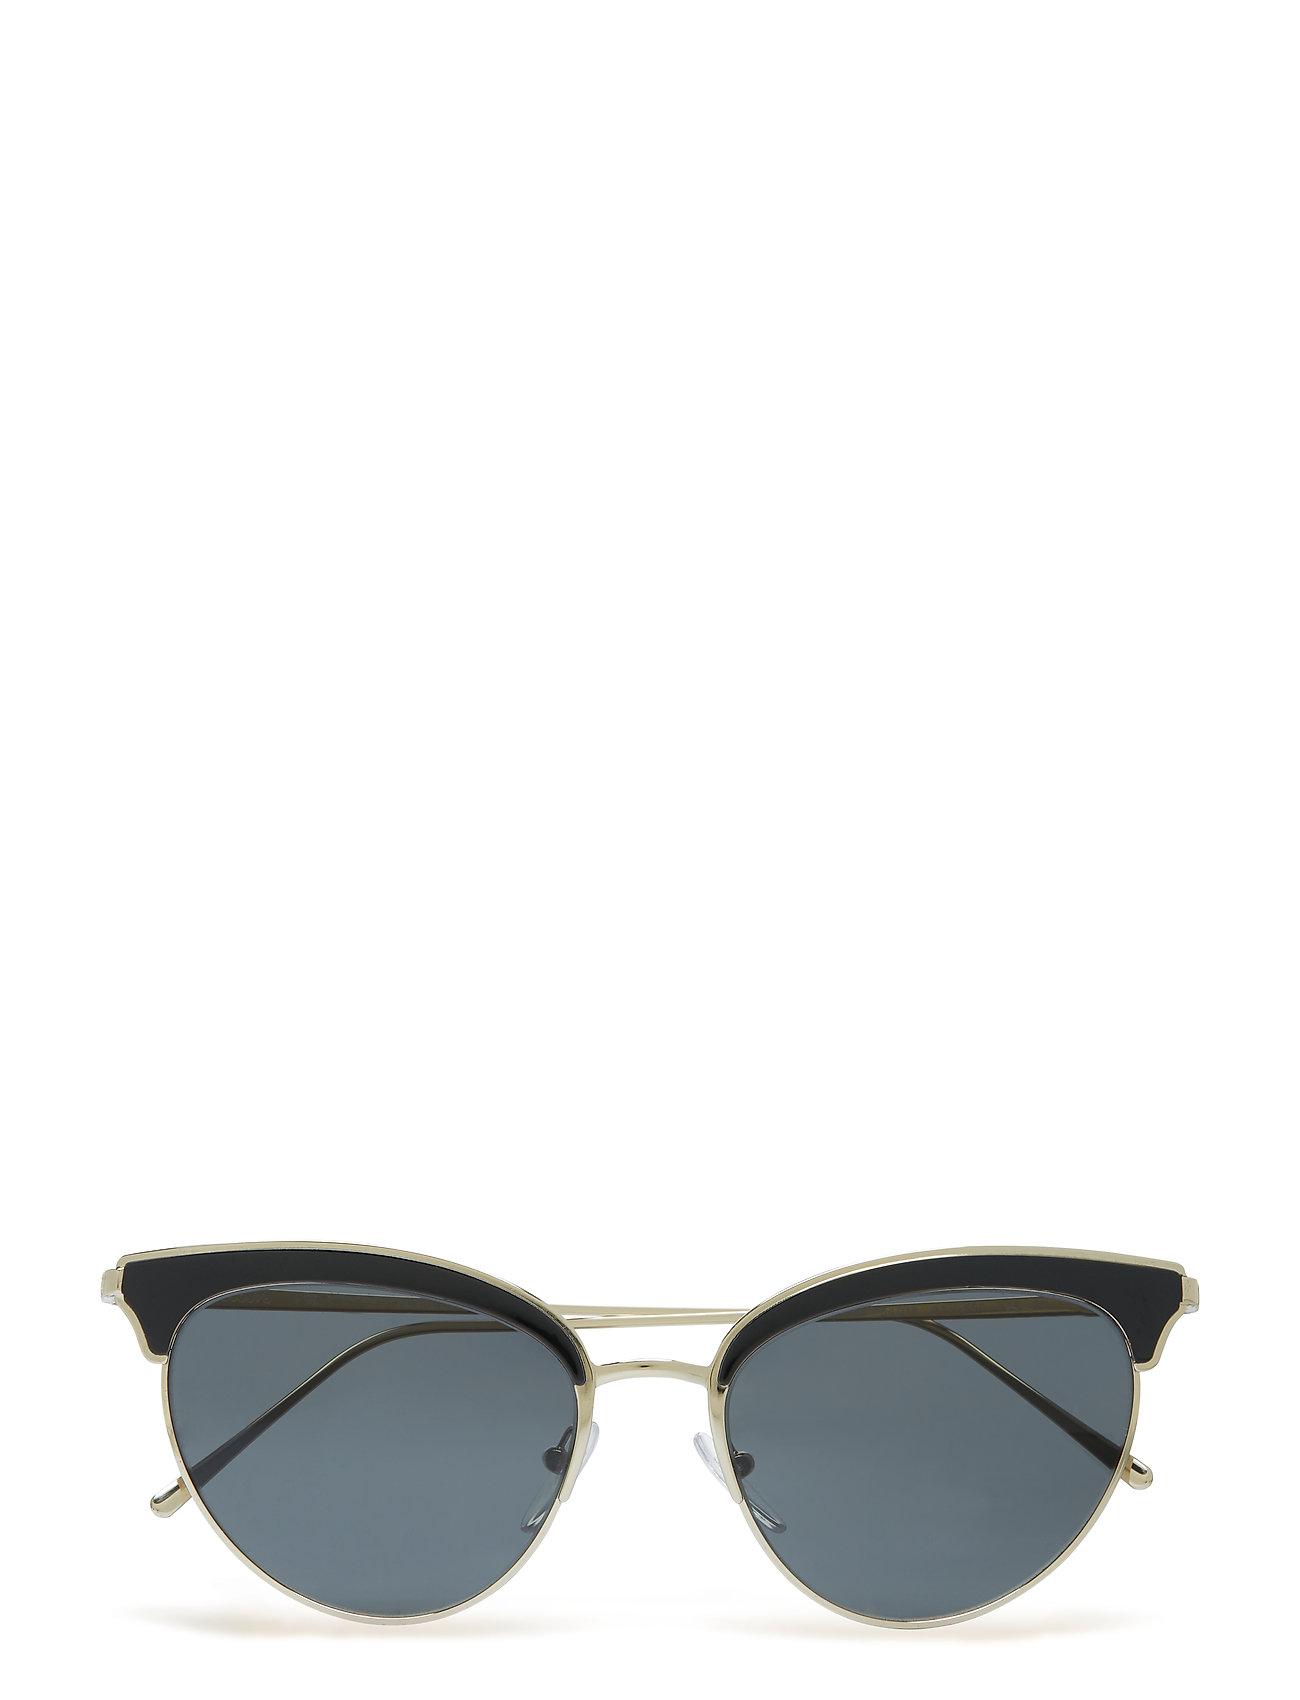 Image of Prada Sunglasses 0pr 60vs Aurinkolasit Sininen